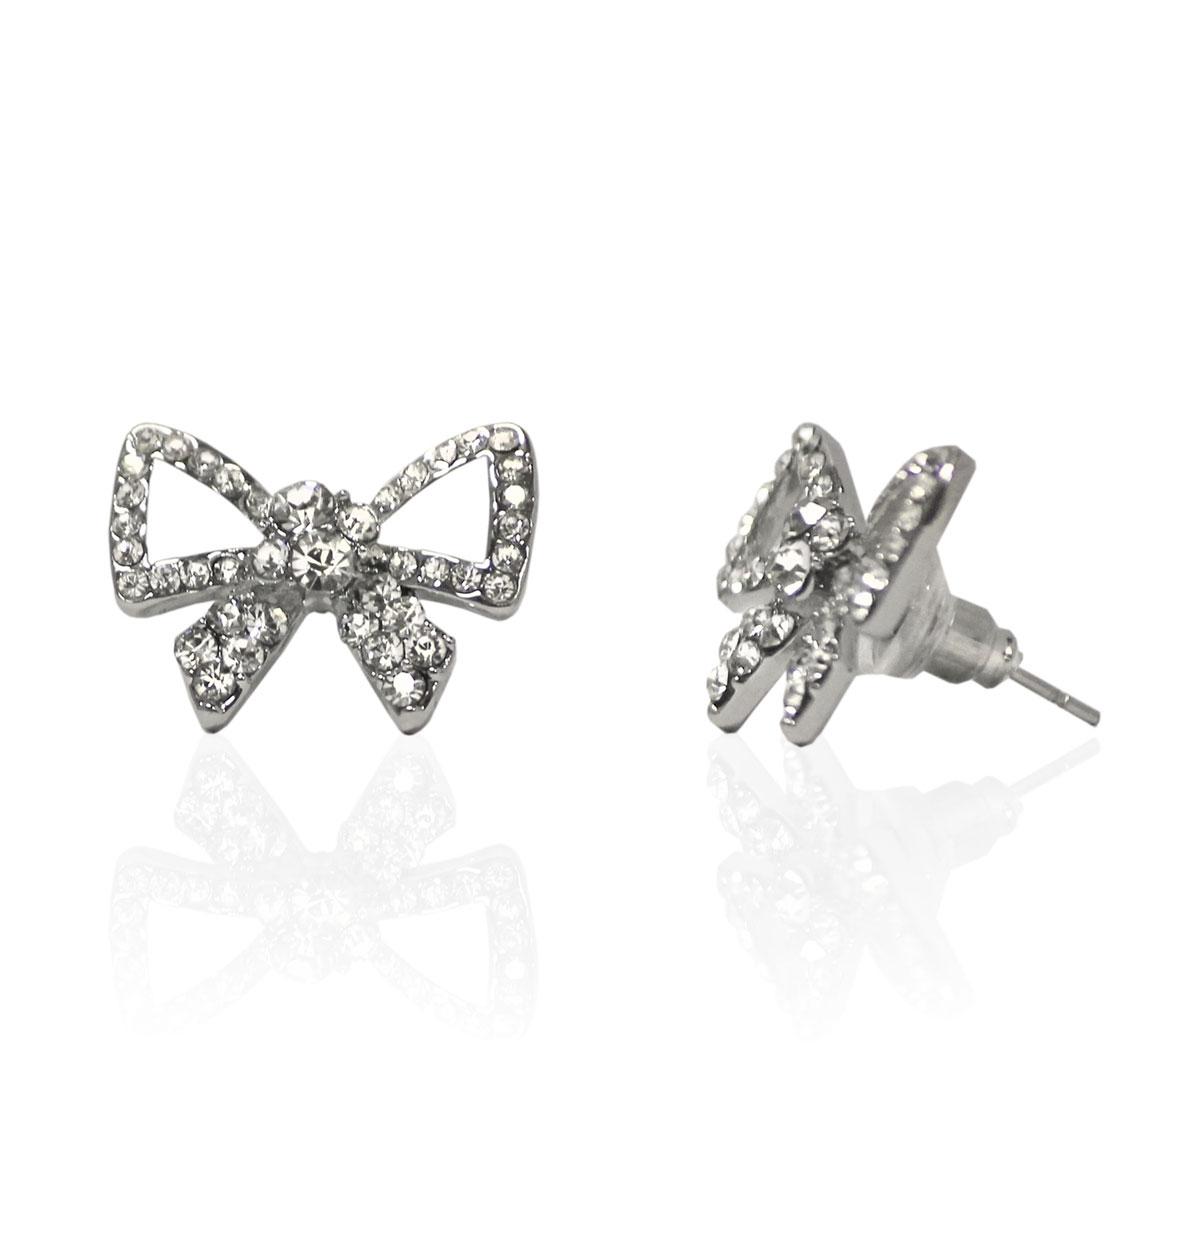 Diamante Bow Studs